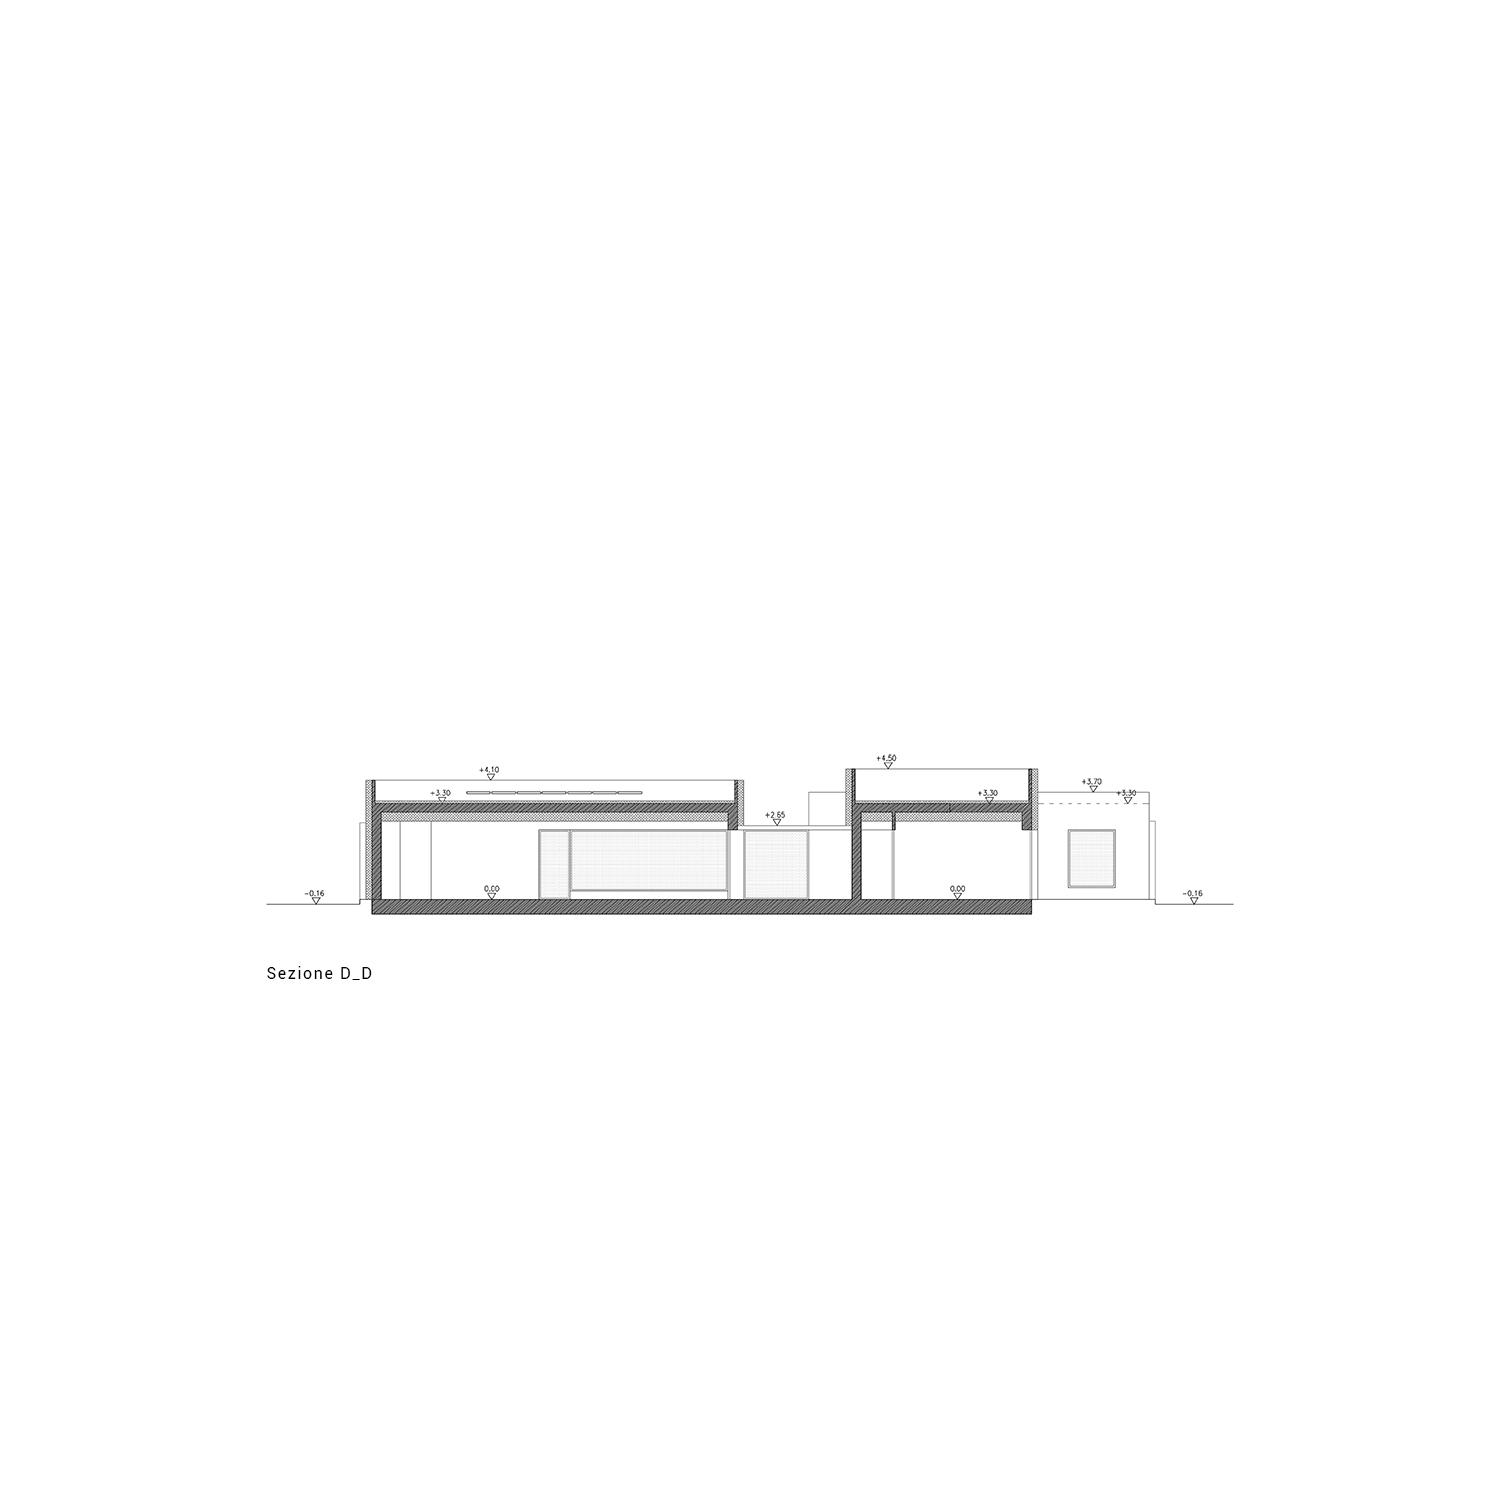 sezione D-D Arch. Salvatore Terranova - Ing. Giorgia Testa}